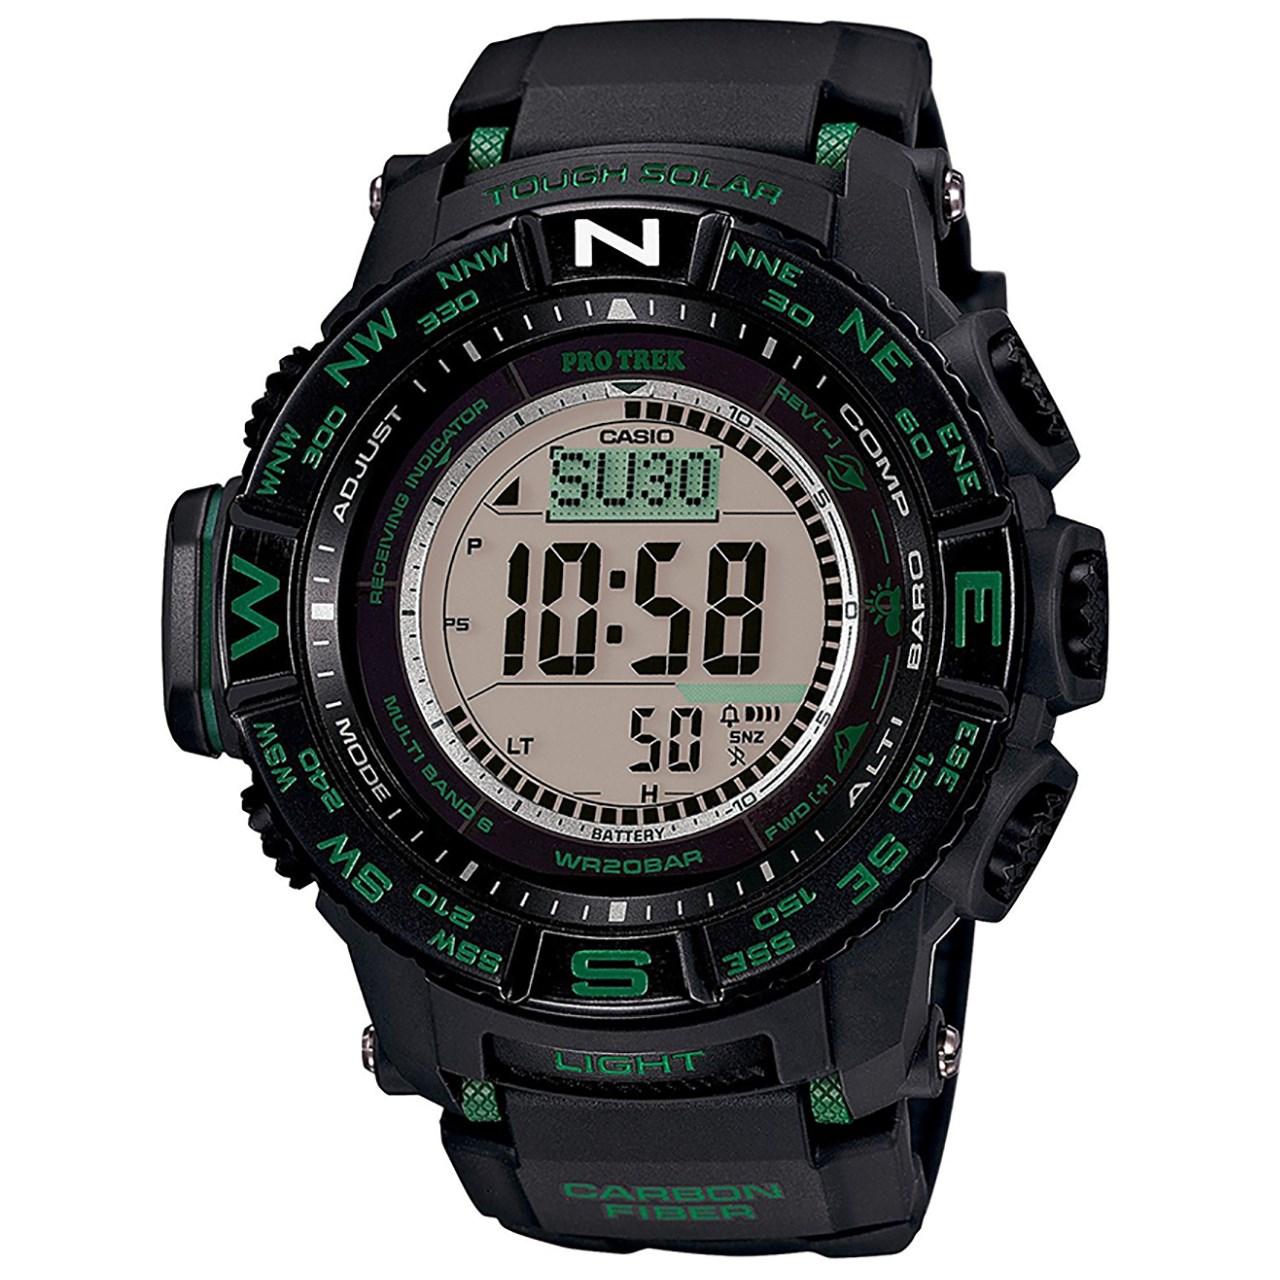 ساعت مچی دیجیتالی  مردانه  کاسیو پروترک مدل PRW-S3500-1DR 35